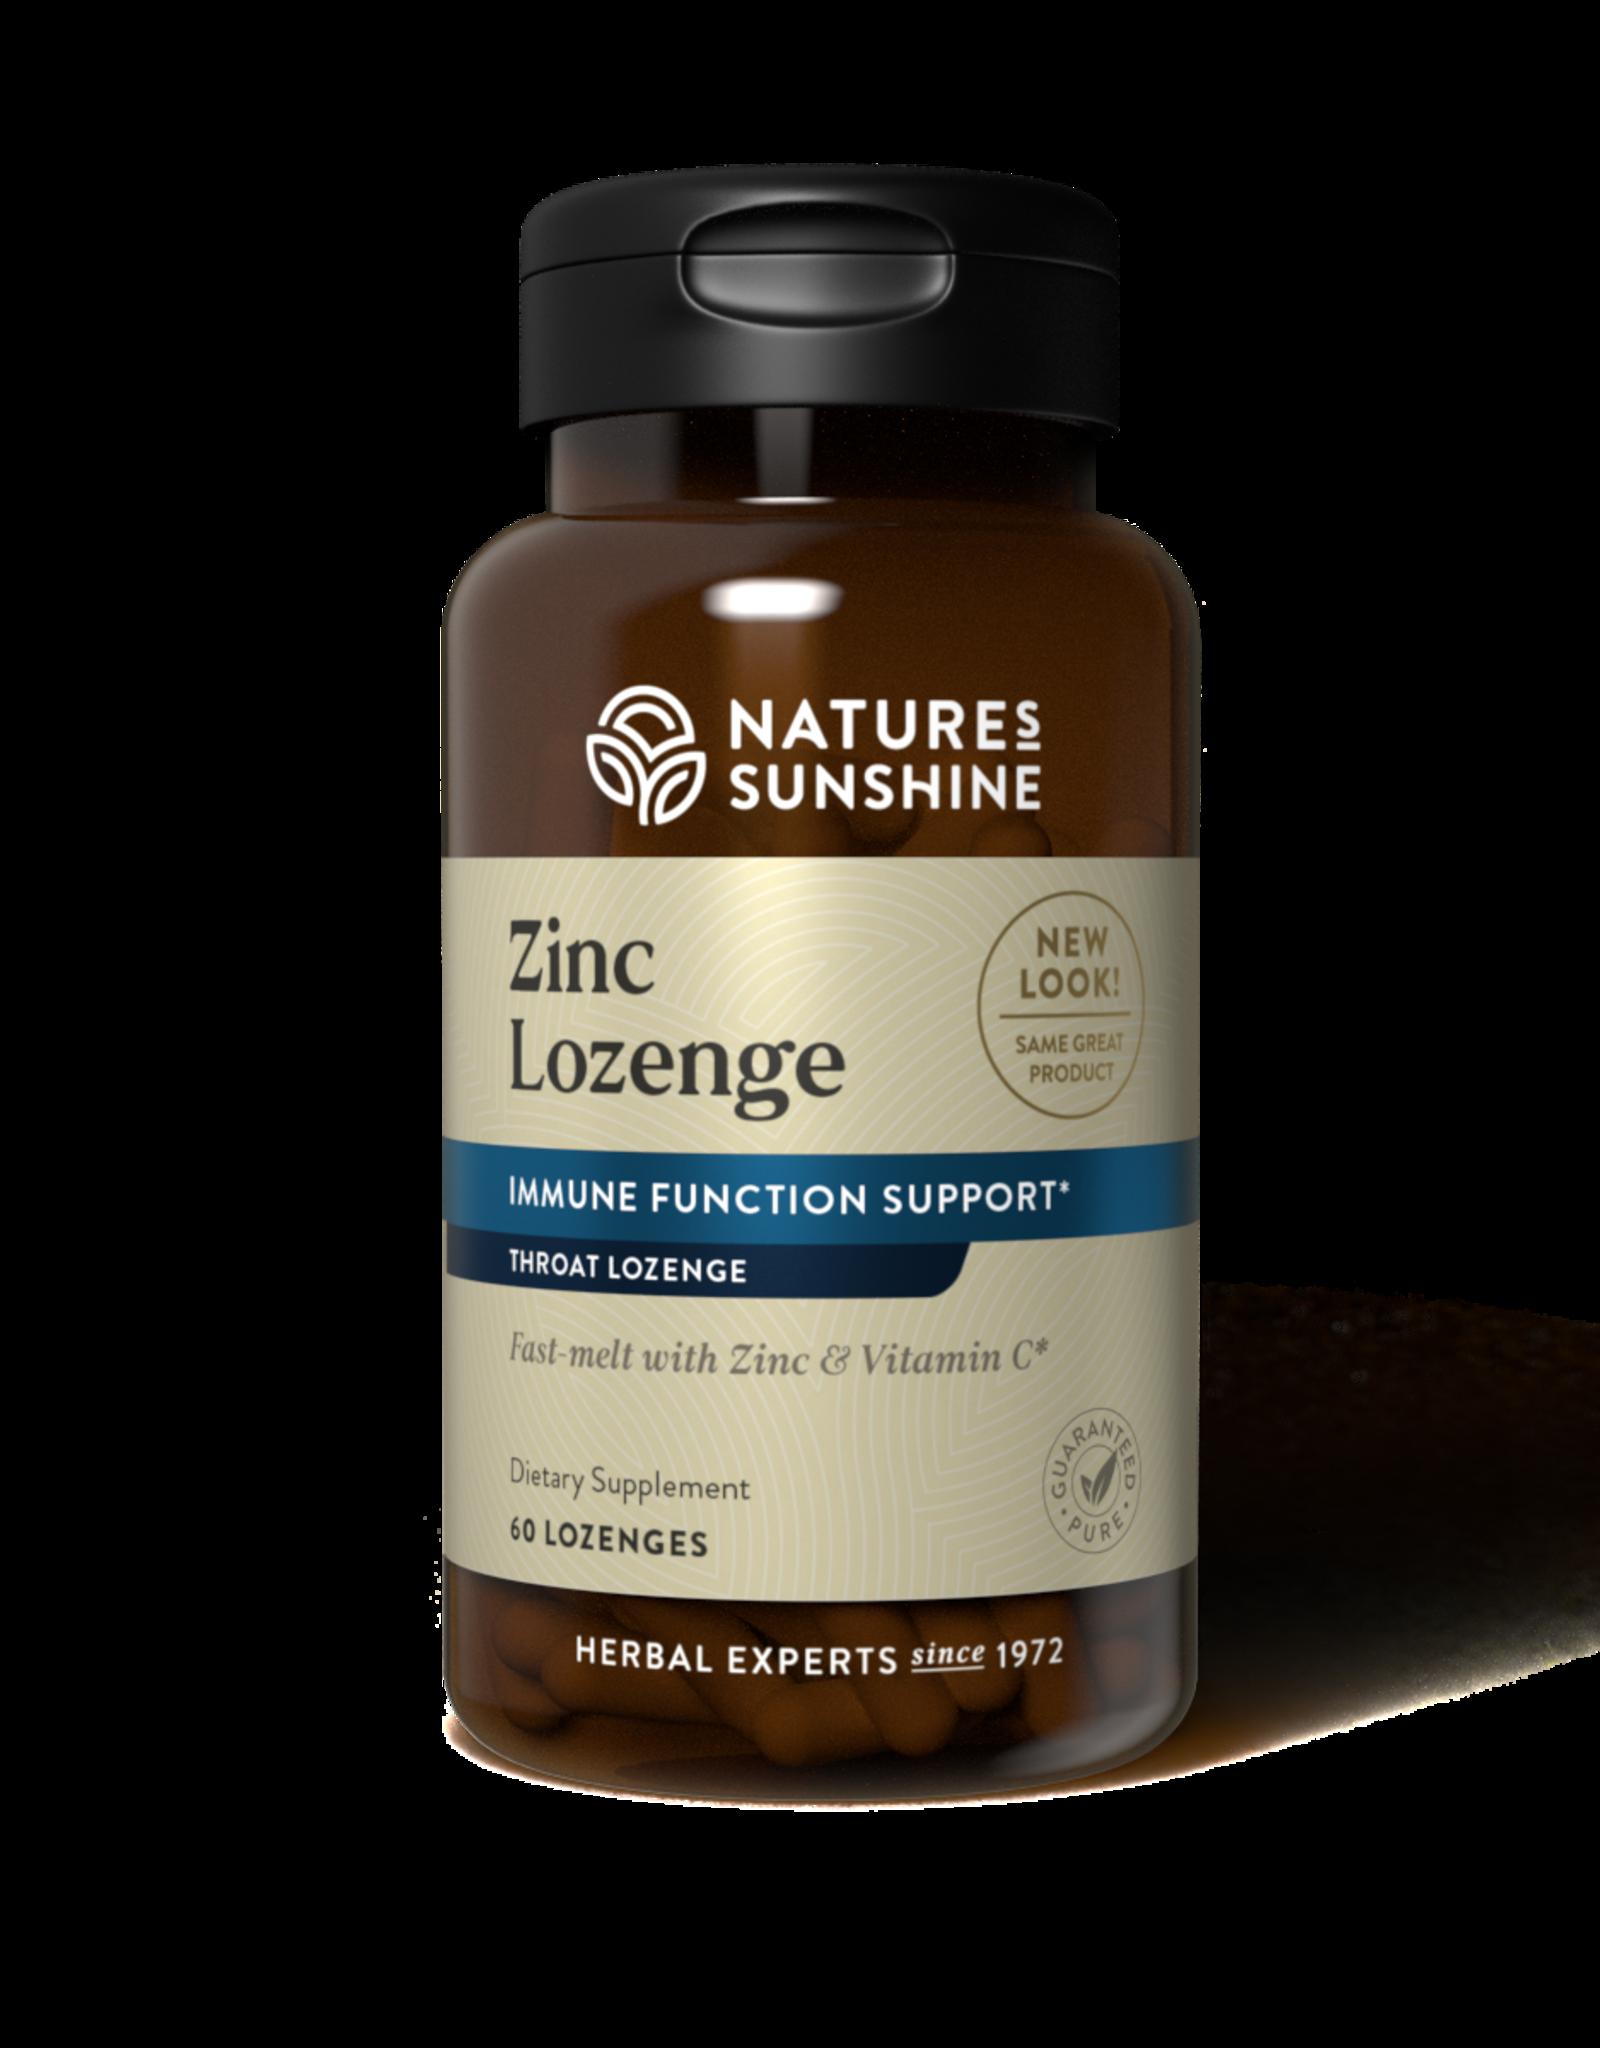 Nature's Sunshine Zinc Lozenge (60 tablets)